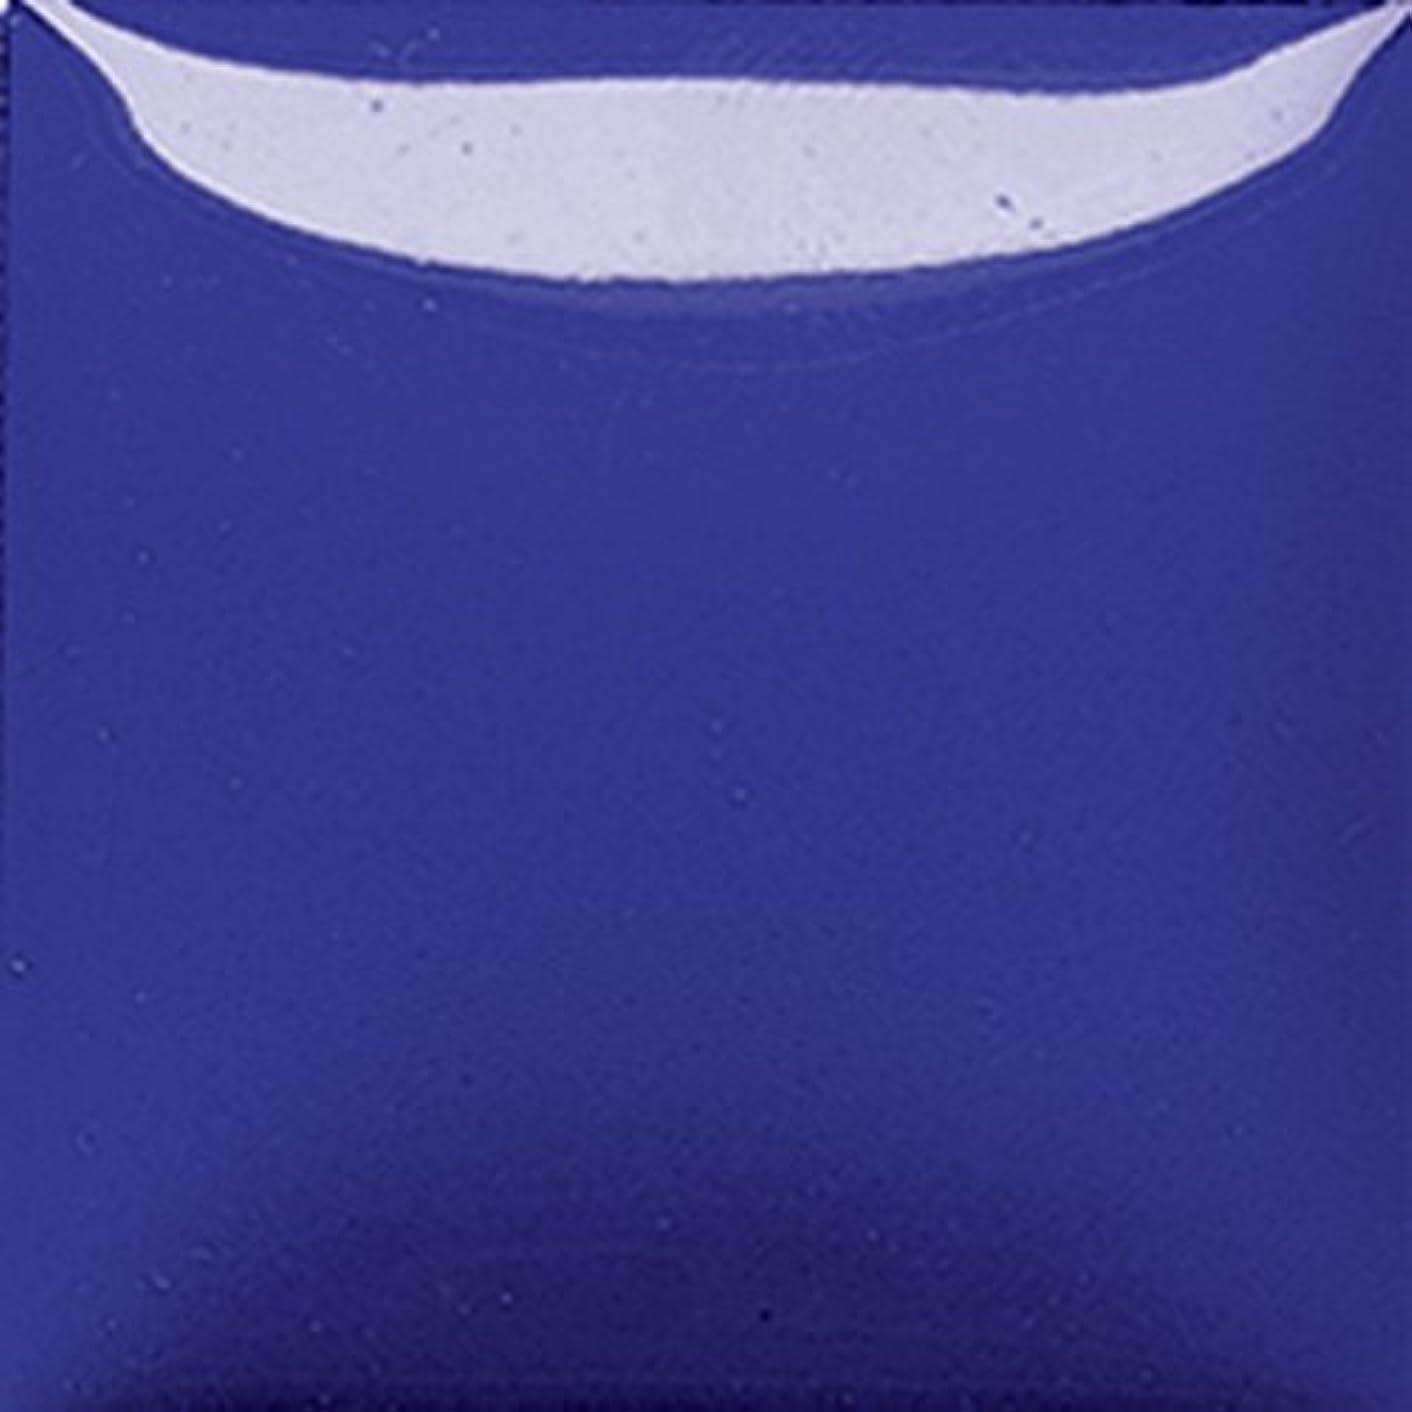 Duncan Envision Glazes - IN 1075 - Cobalt Blue - Pint